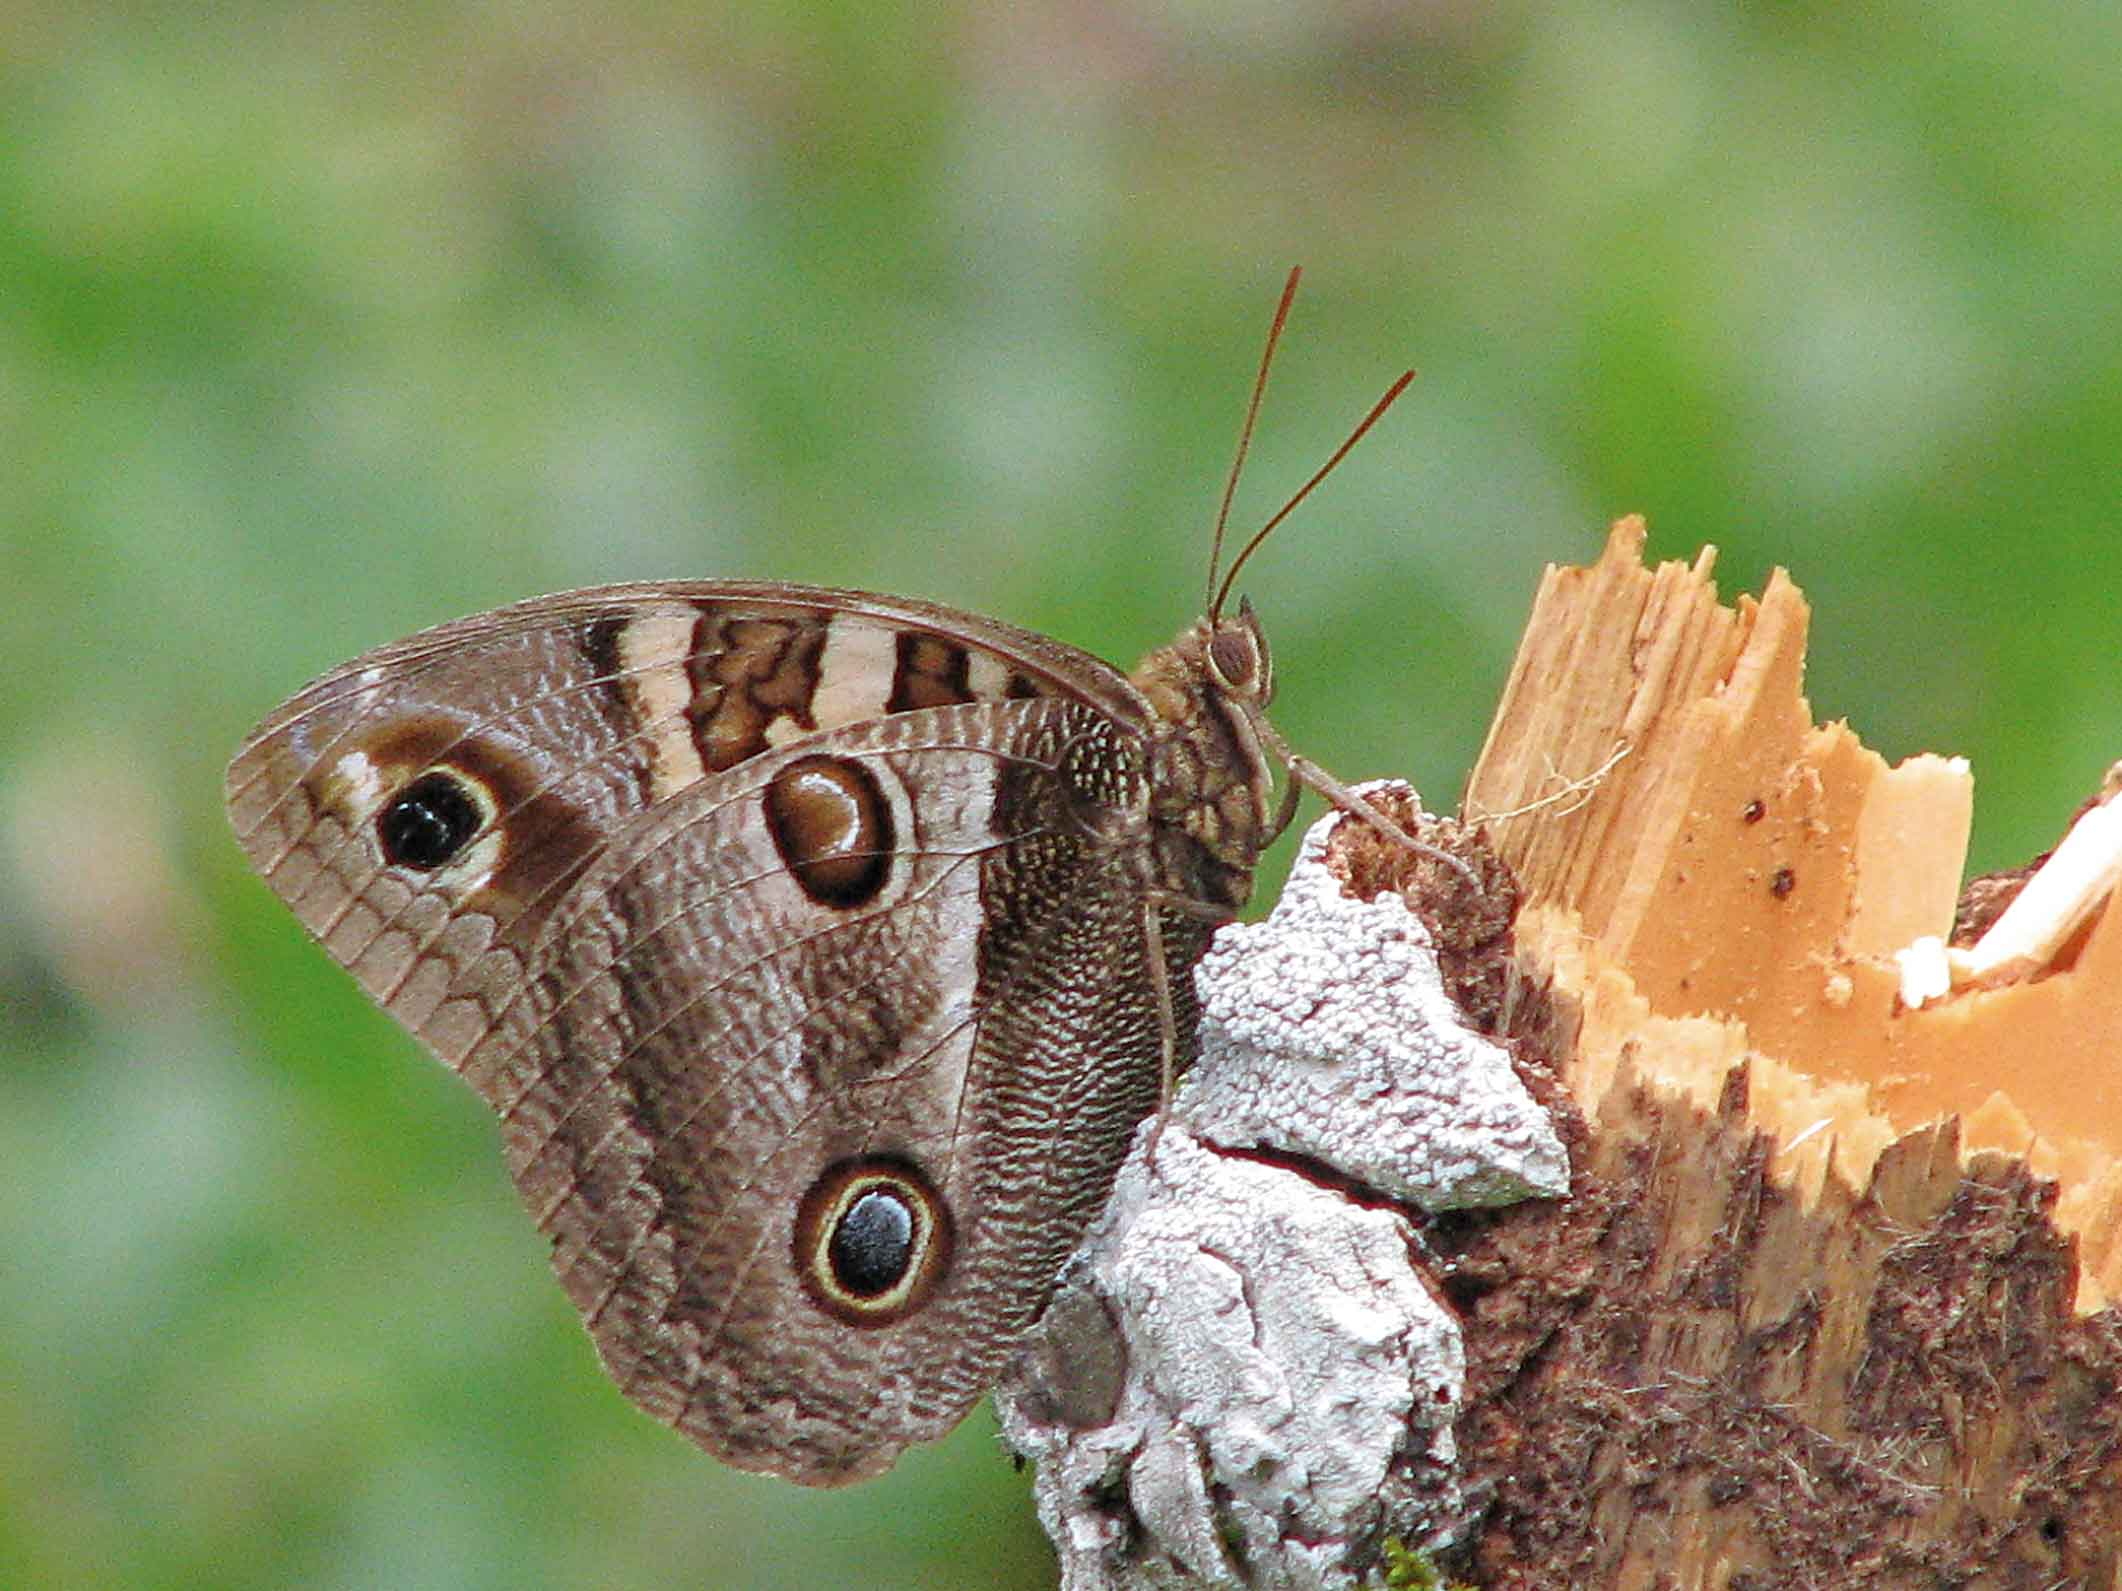 Mantiqueira-Meio-Ambiente-Borboletas-Blepolenis-Batea-Lino-Matheus-bx